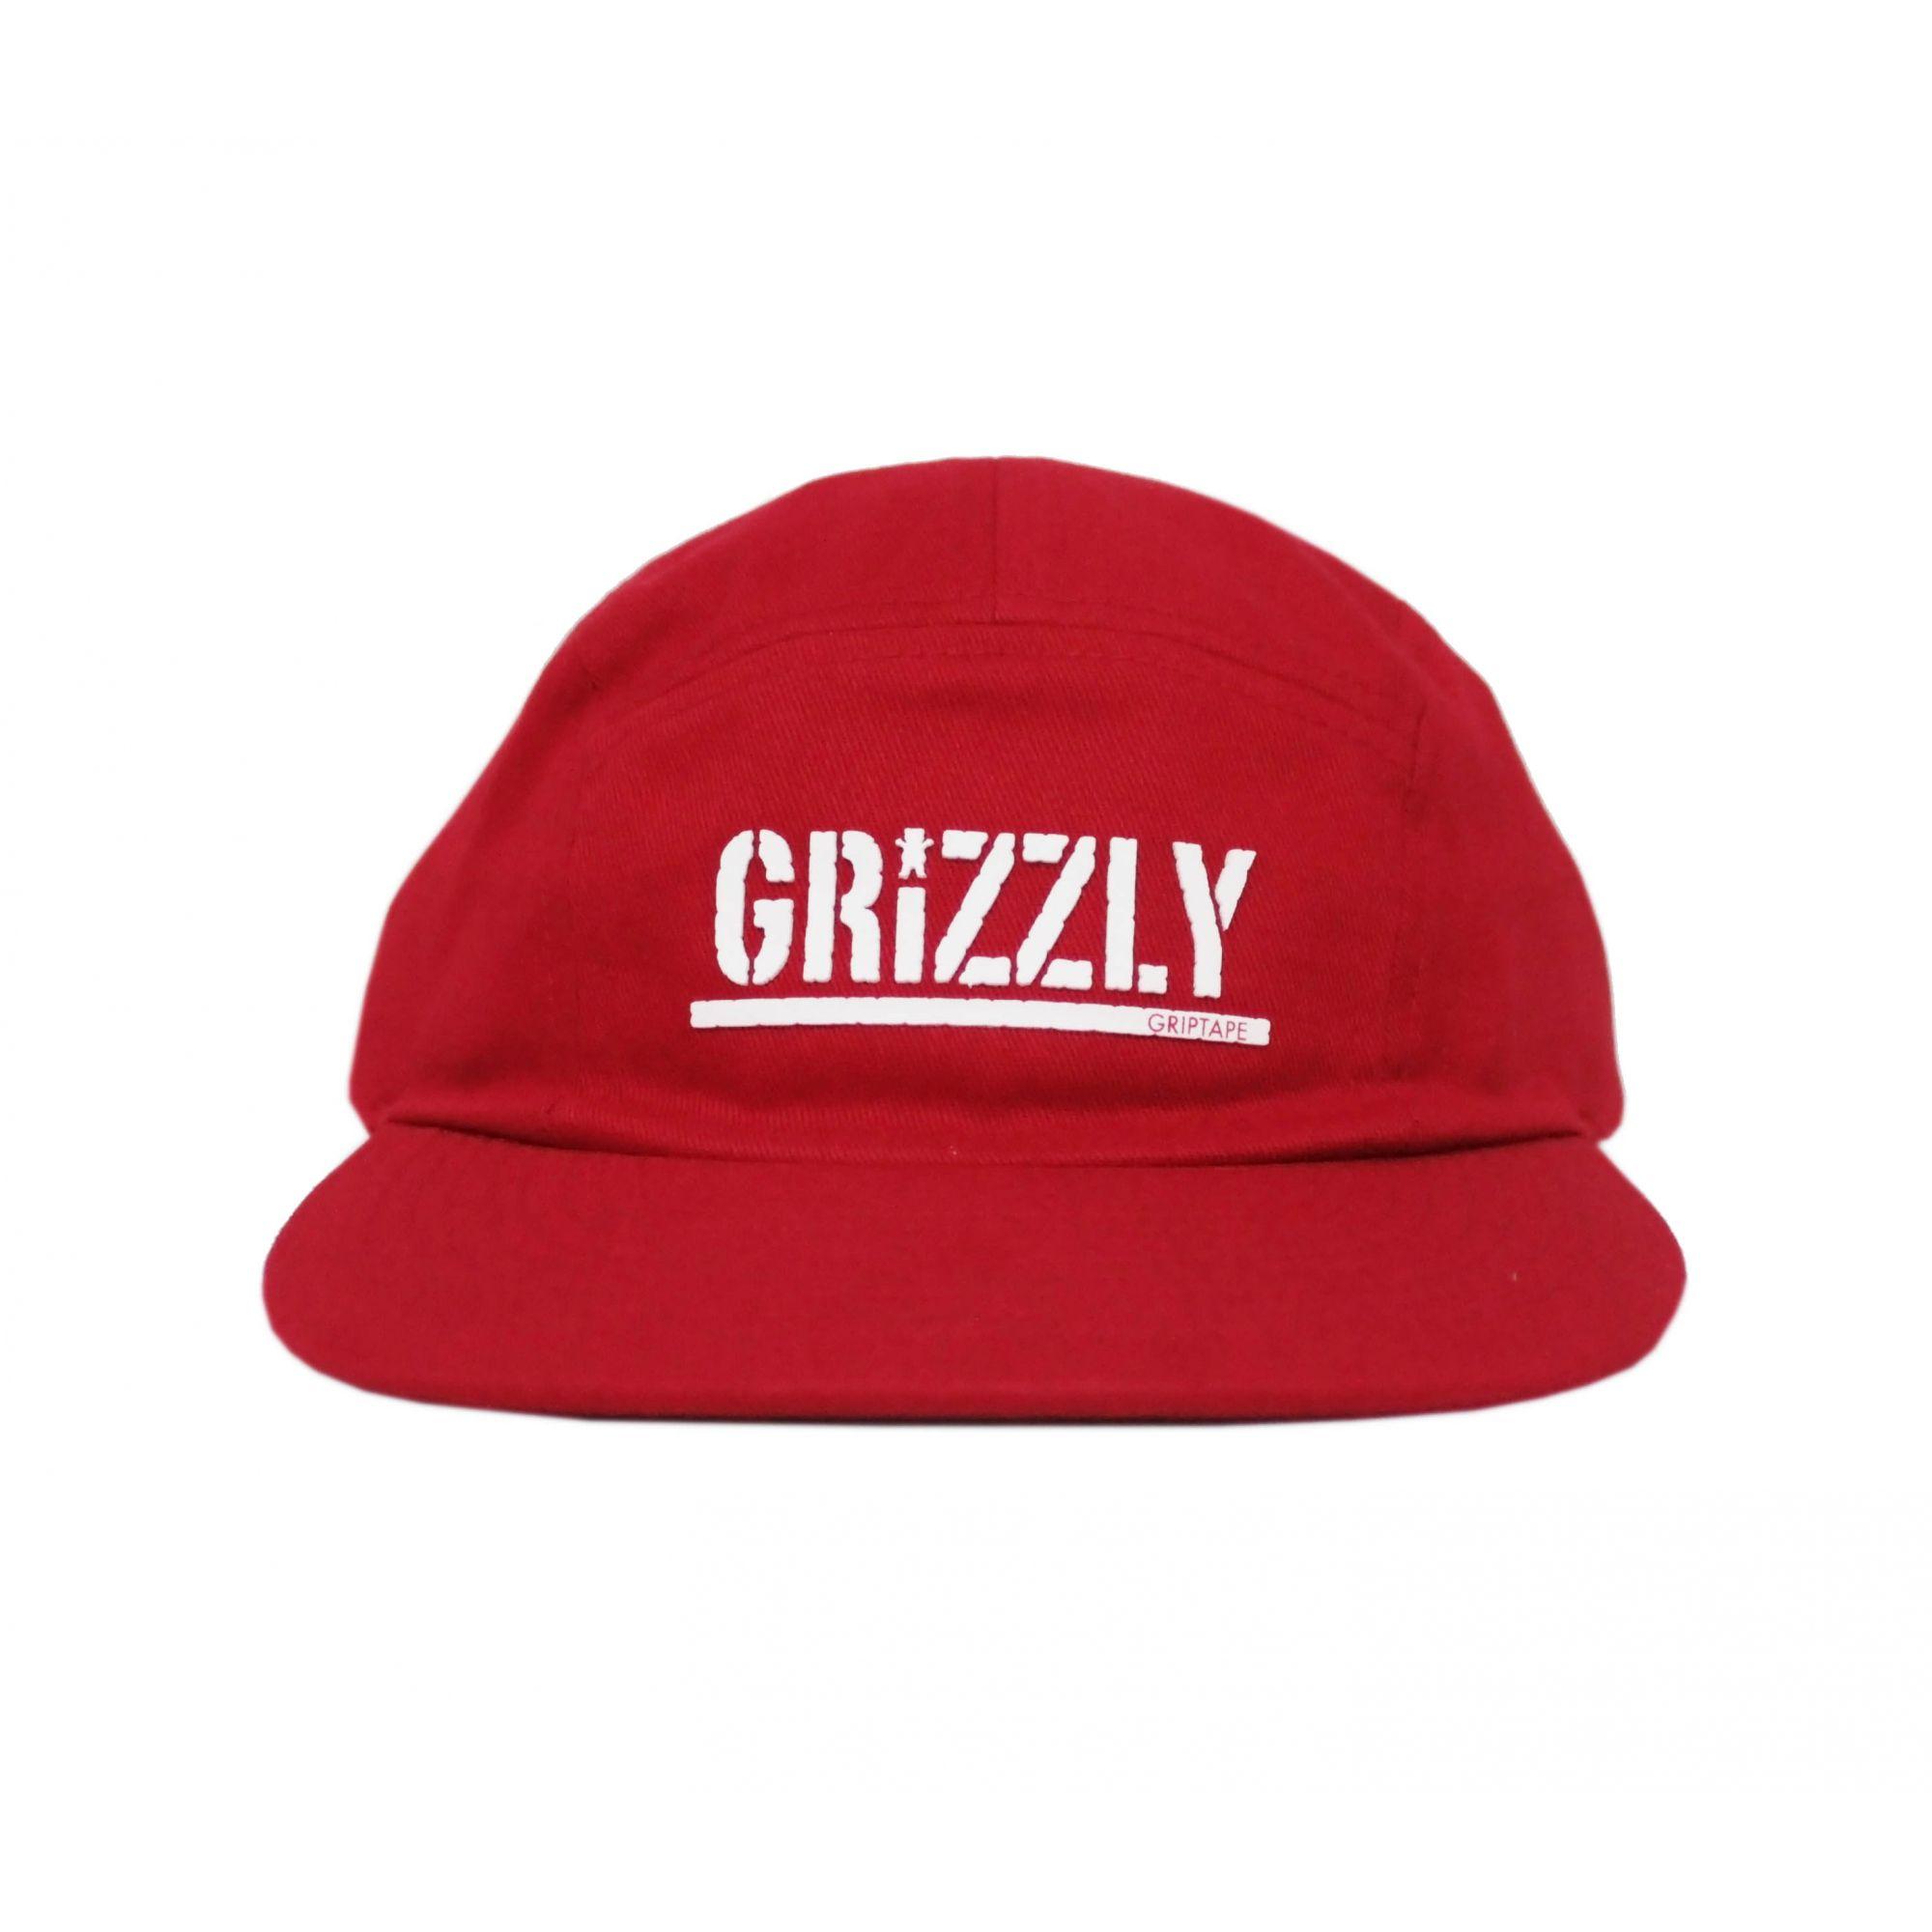 Boné Grizzly Five Panel Stamped Camper Unstructer Clip Vermelho